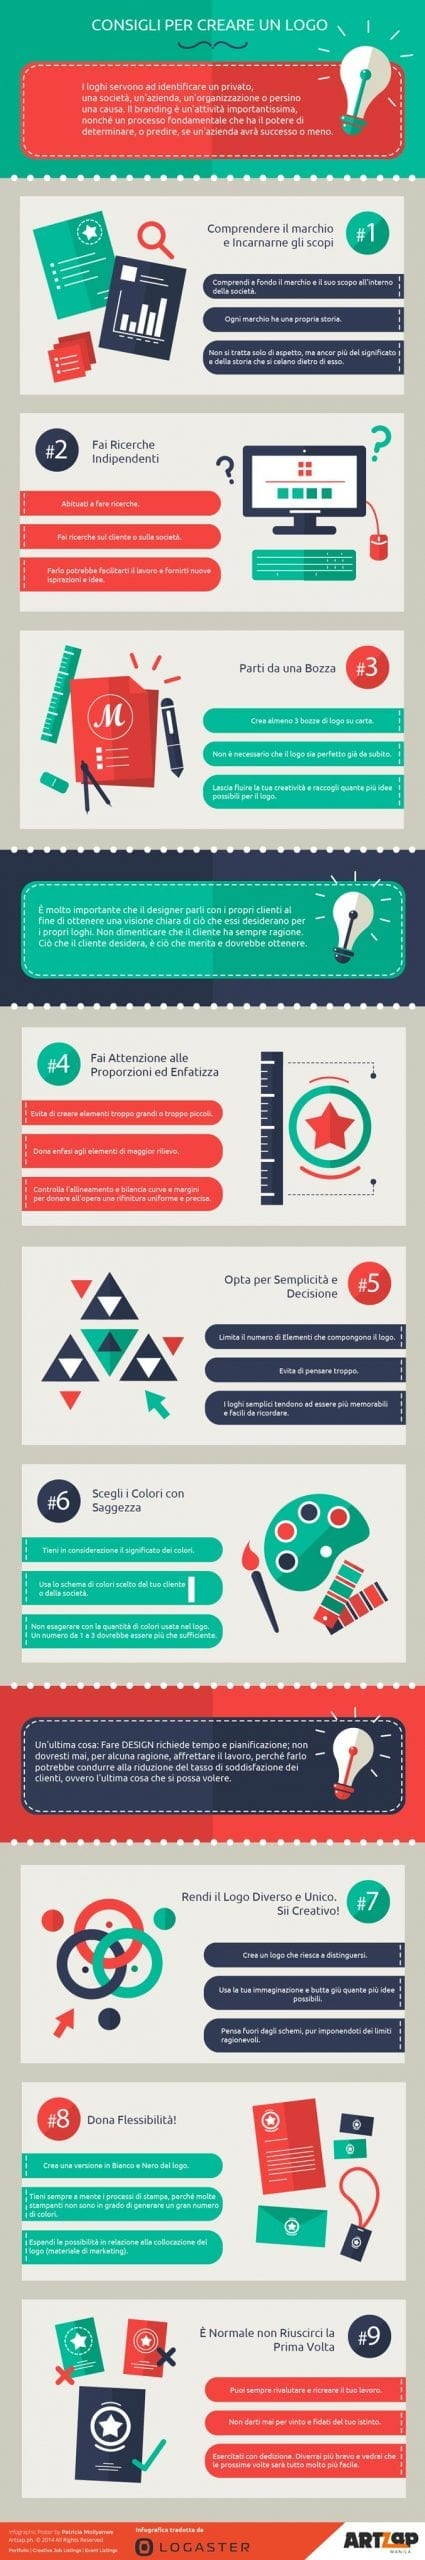 come creare un logo infografica